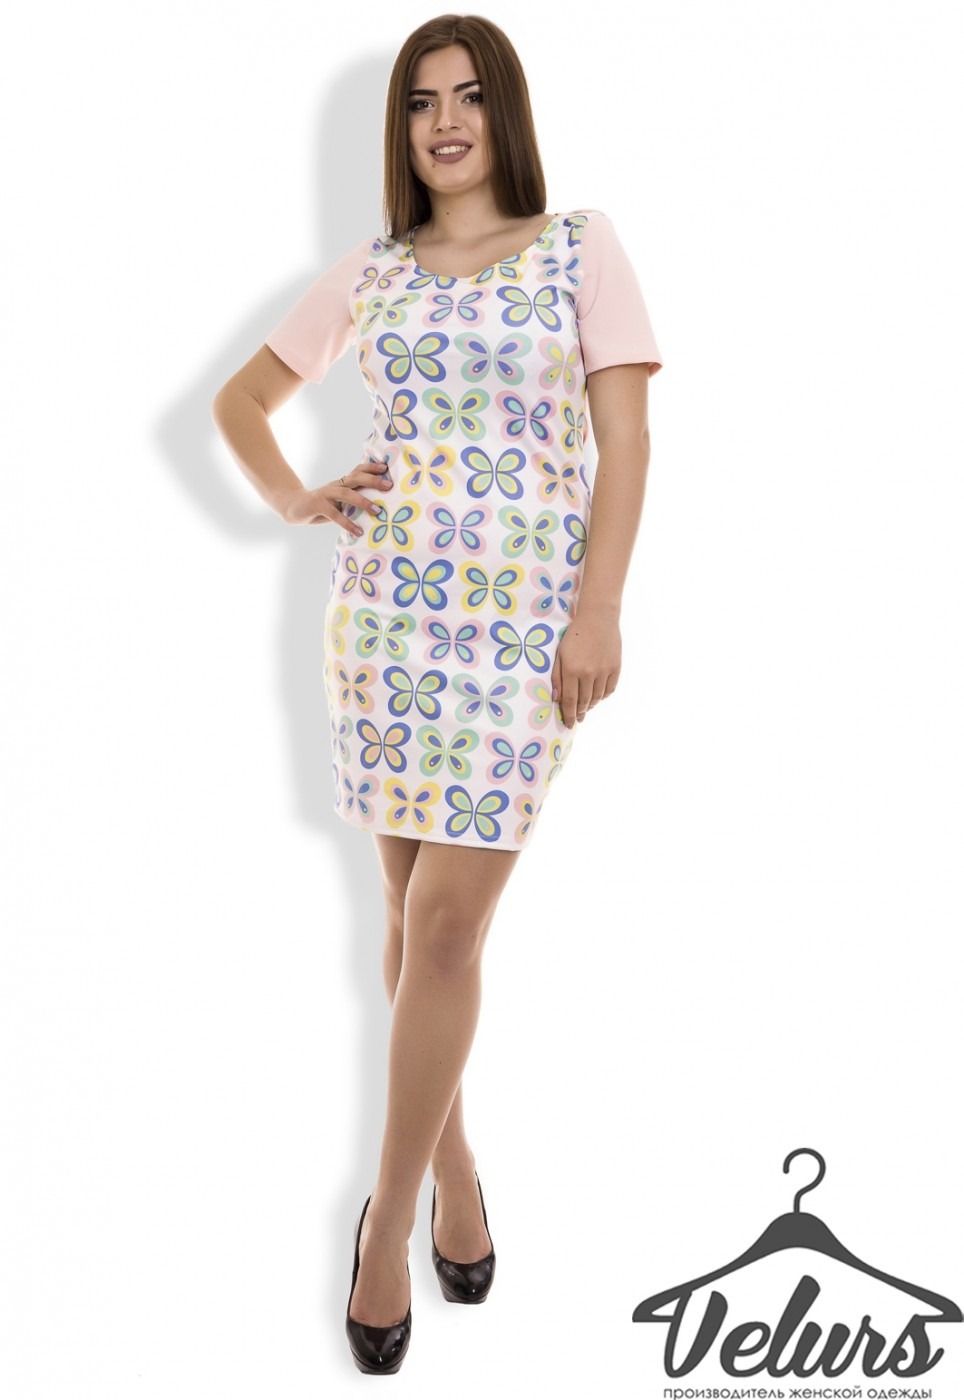 Velurs: Платье 212108 - фото 7